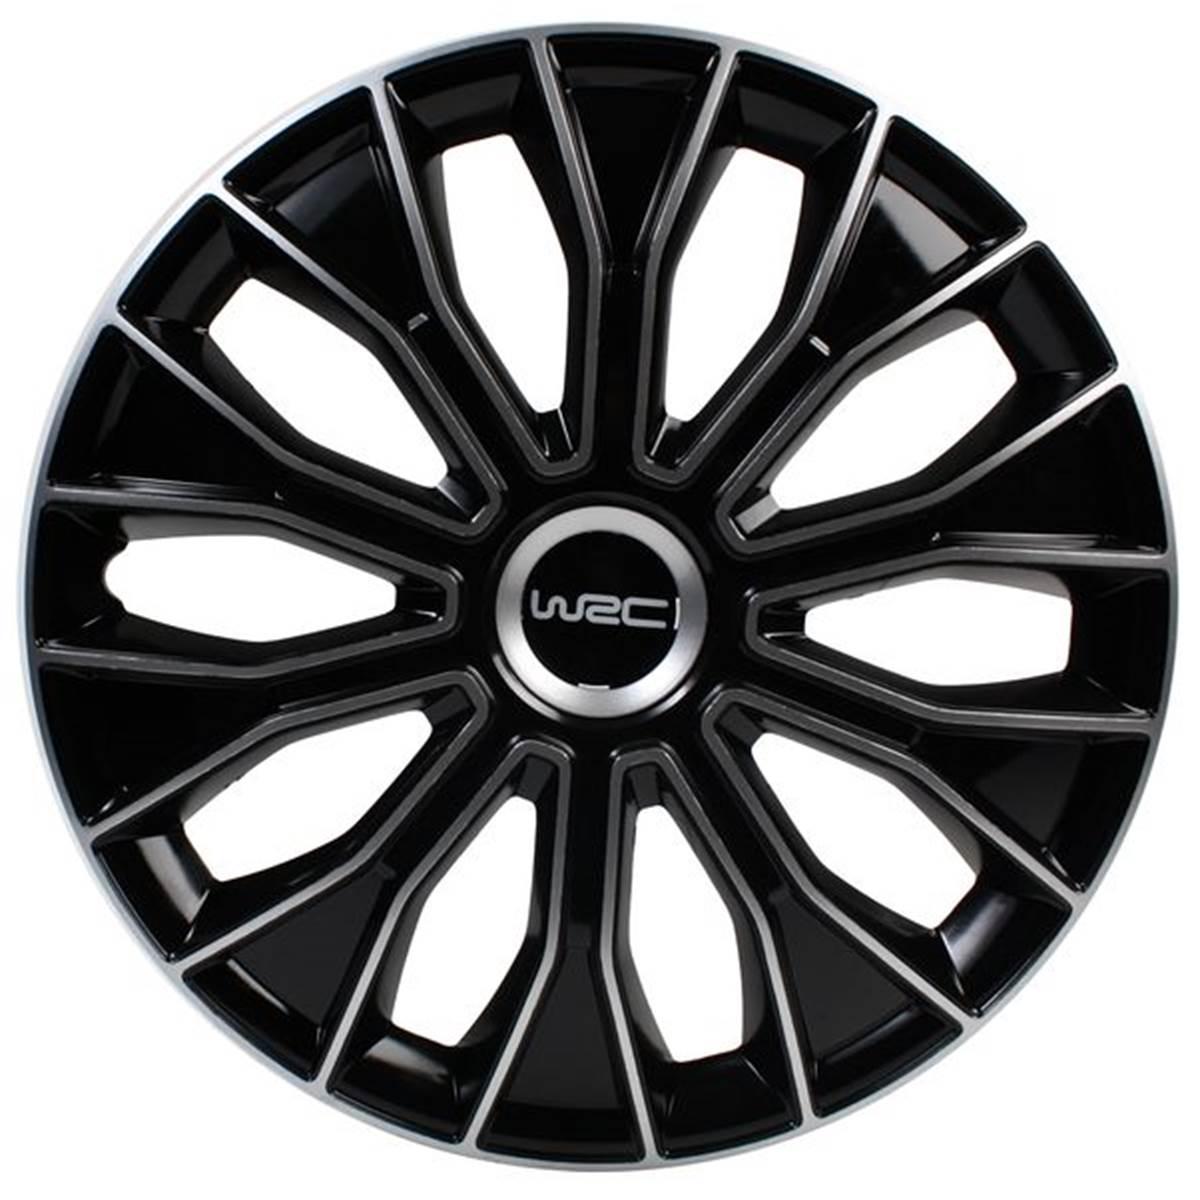 4 Enjoliveurs WRC 15 N°15 Noir/Argent\